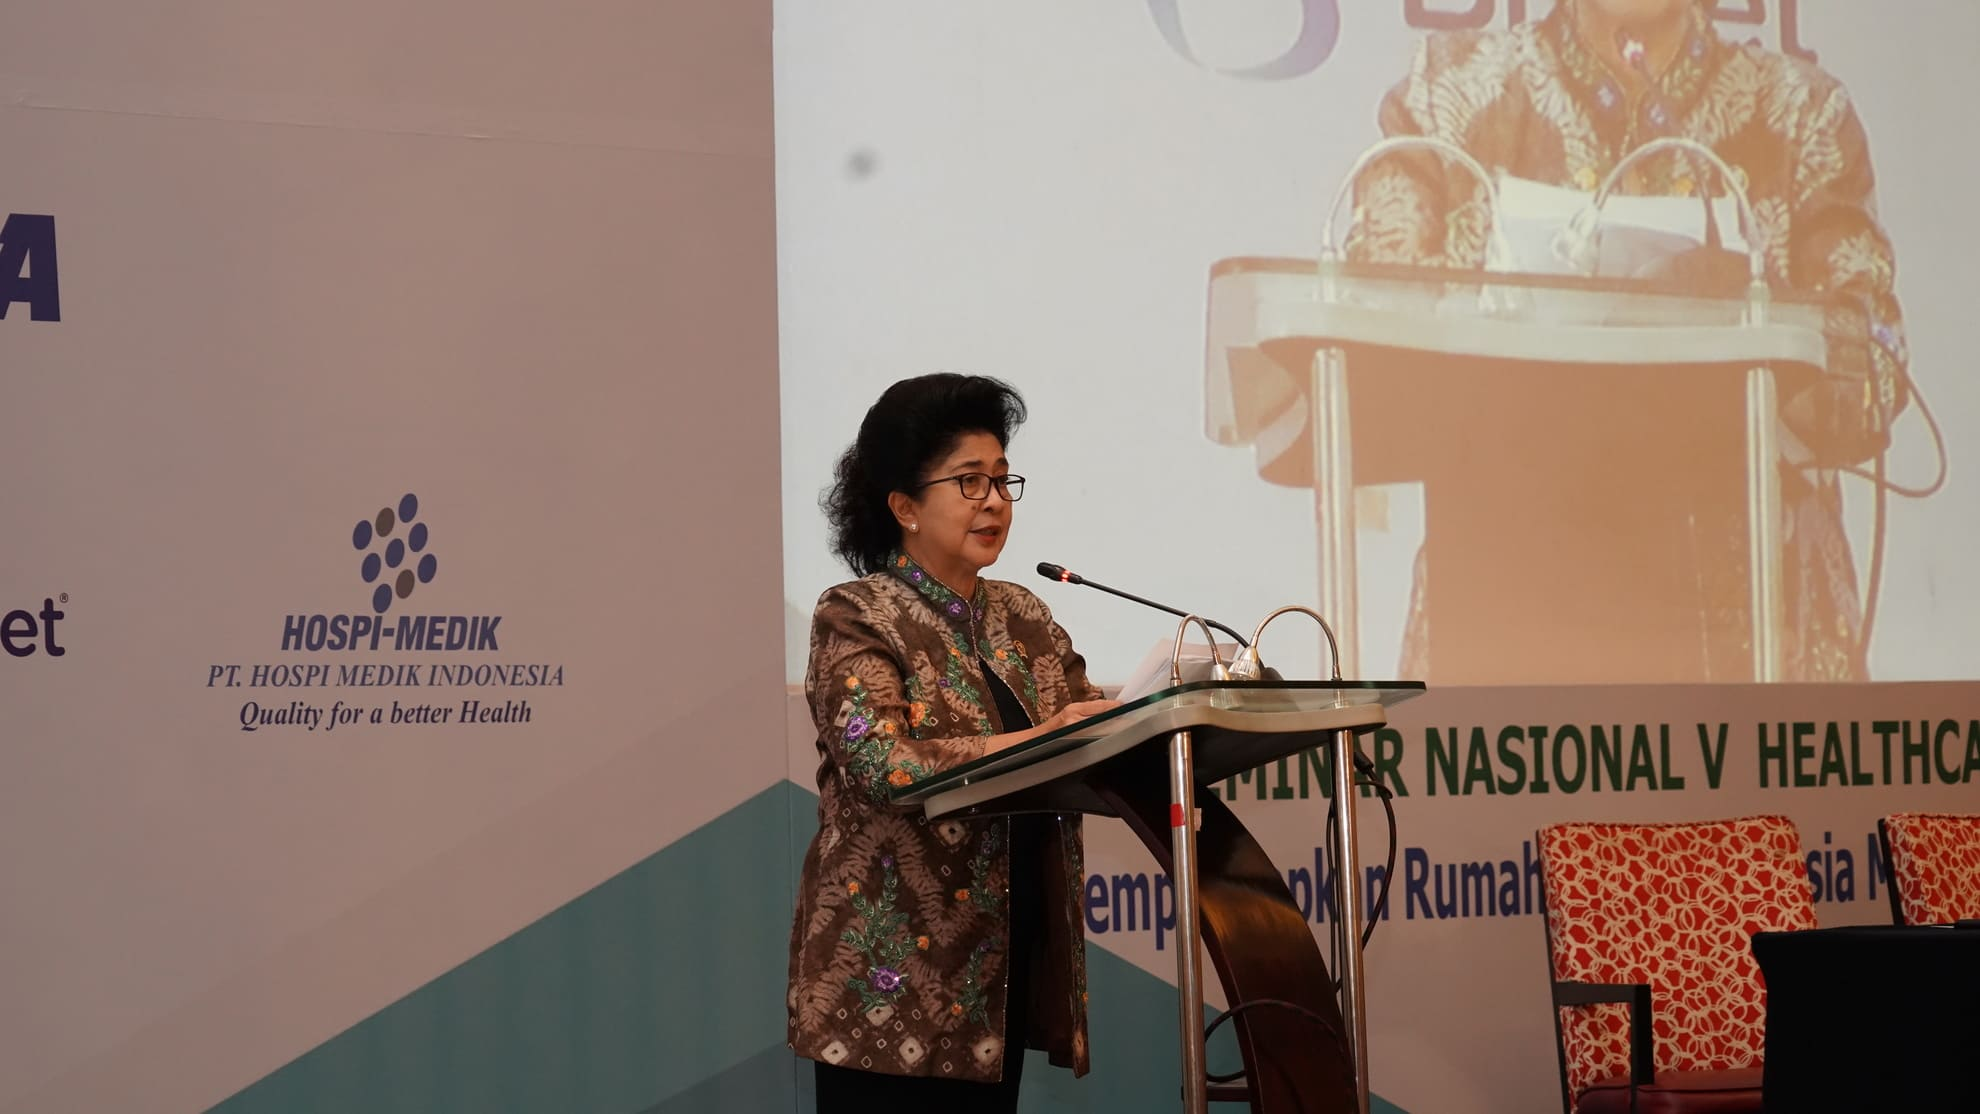 18-7-2018-keynote-speech-seminar-nasional-v-health-ecpo-iv-arssi-1